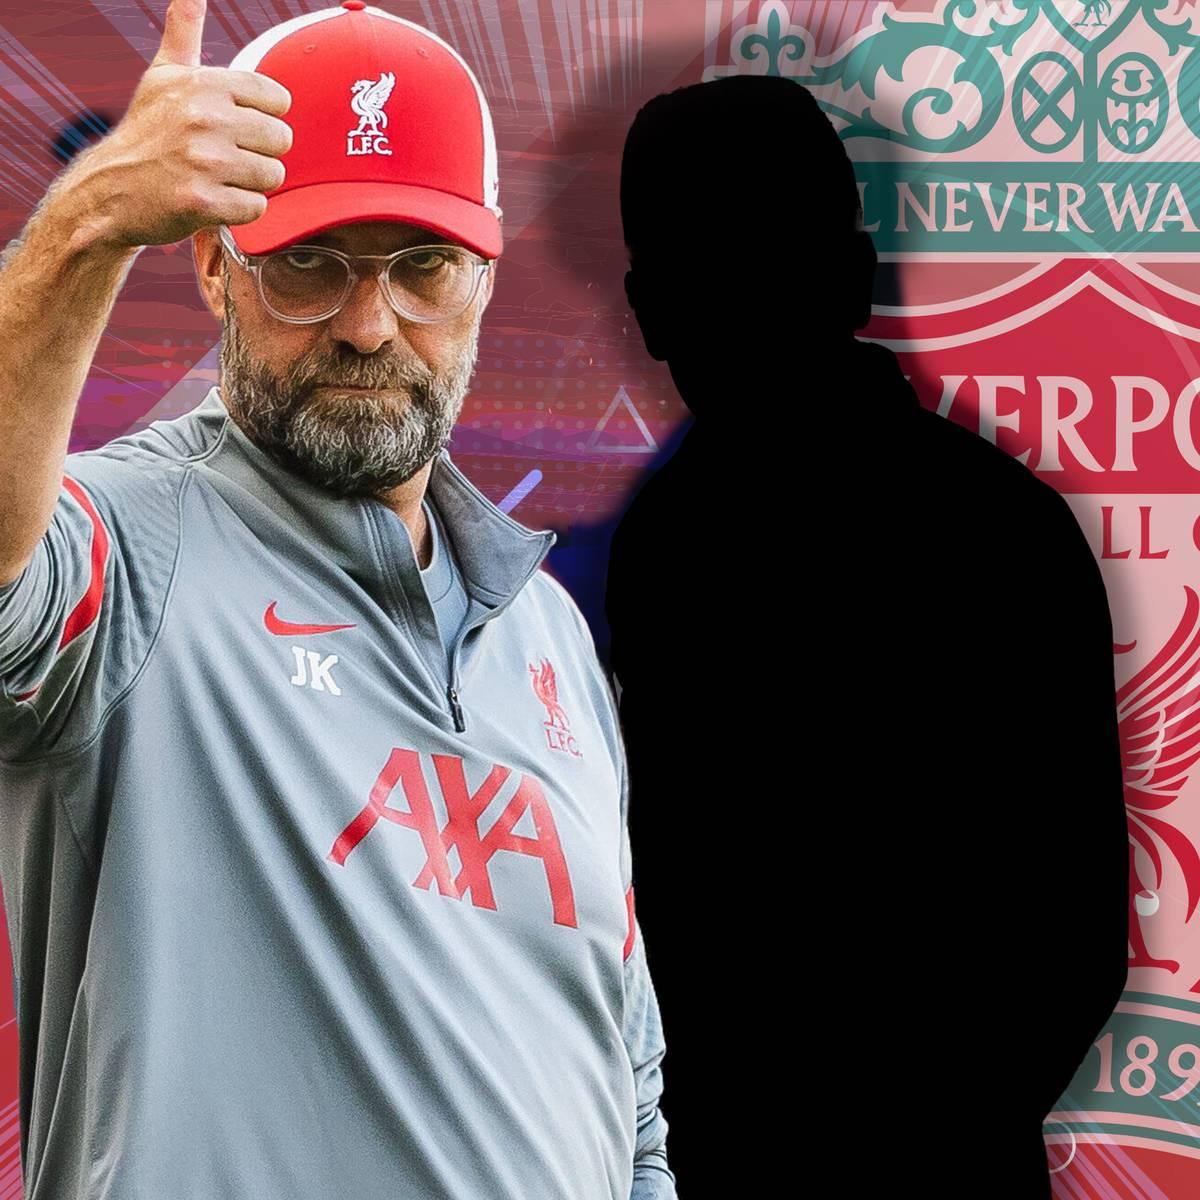 Liverpool-Star verrät: Das ist Klopps Lieblingsspieler